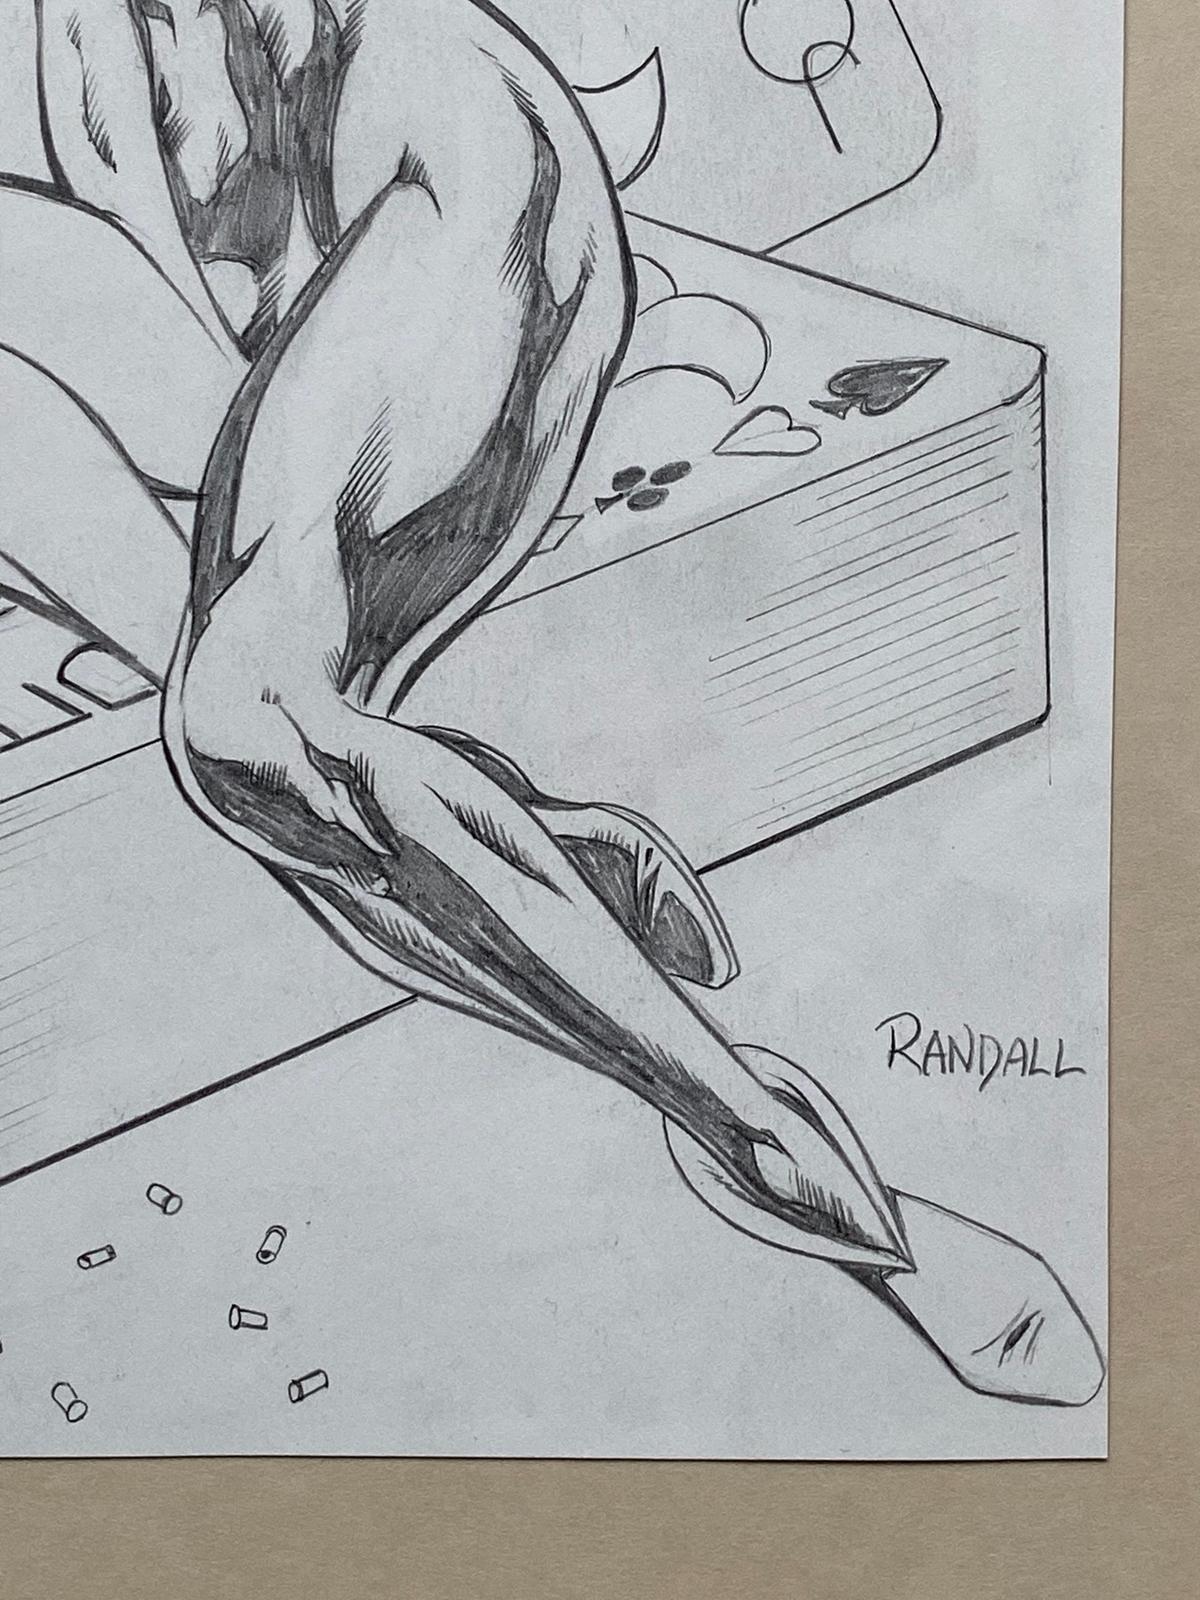 Lot 2192 - HARLEY QUINN ORIGINAL ILLUSTRATION BY RON RANDALL - SIGNED BY RON RANDALL - Harley Quinn pin-up in